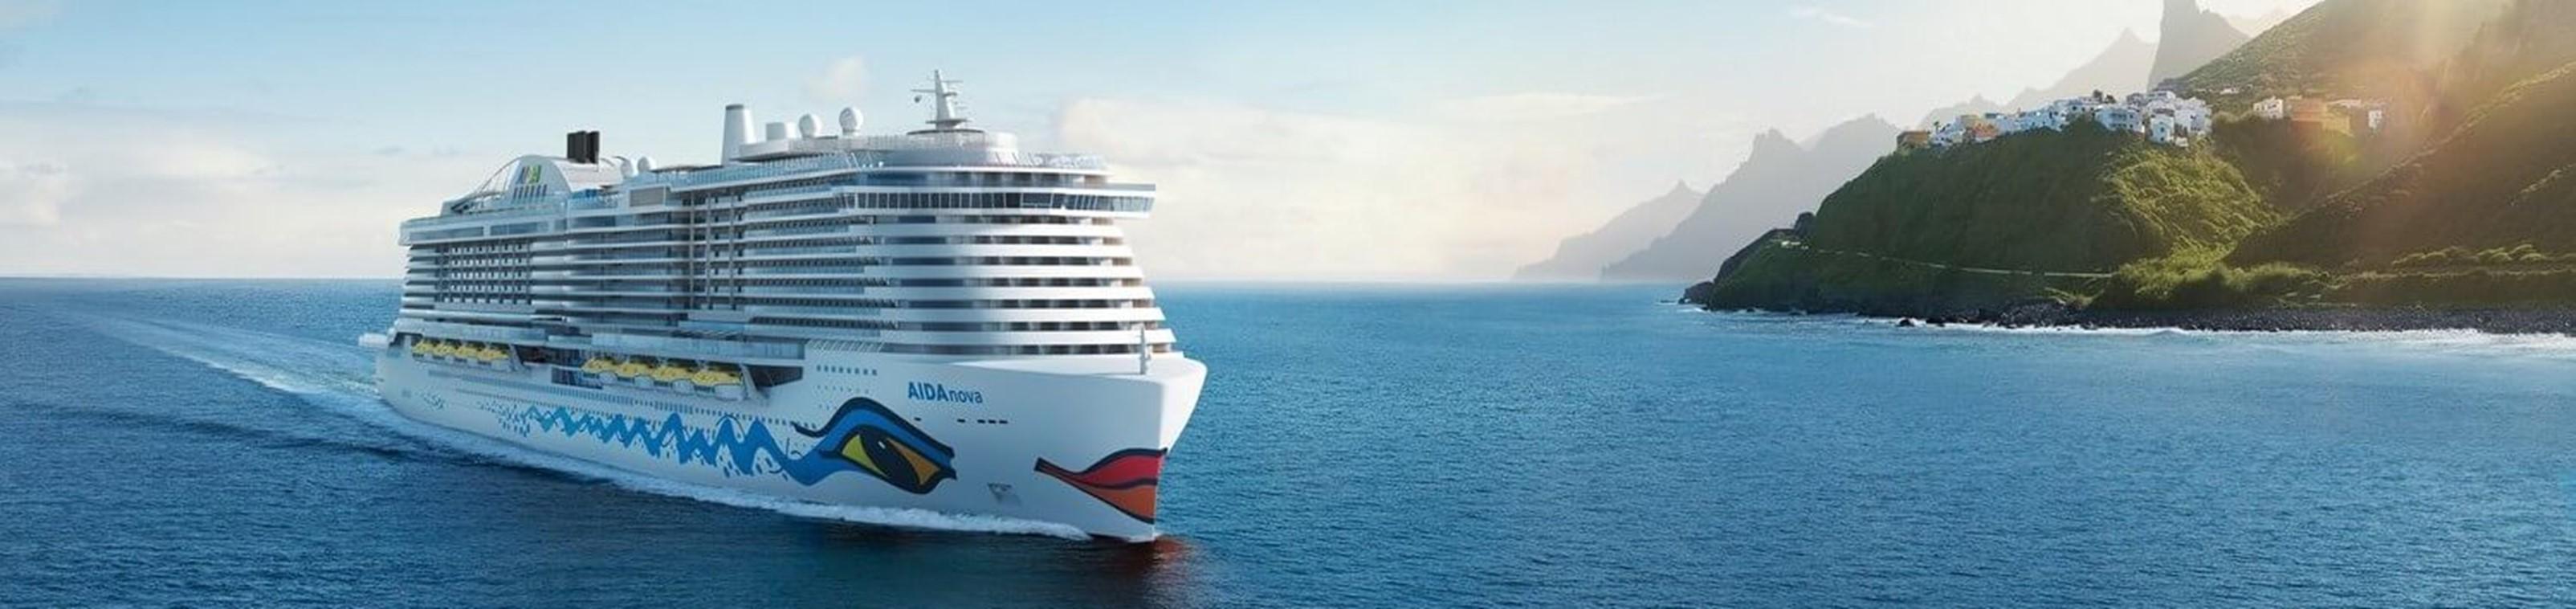 Middellandse Zee Cruise